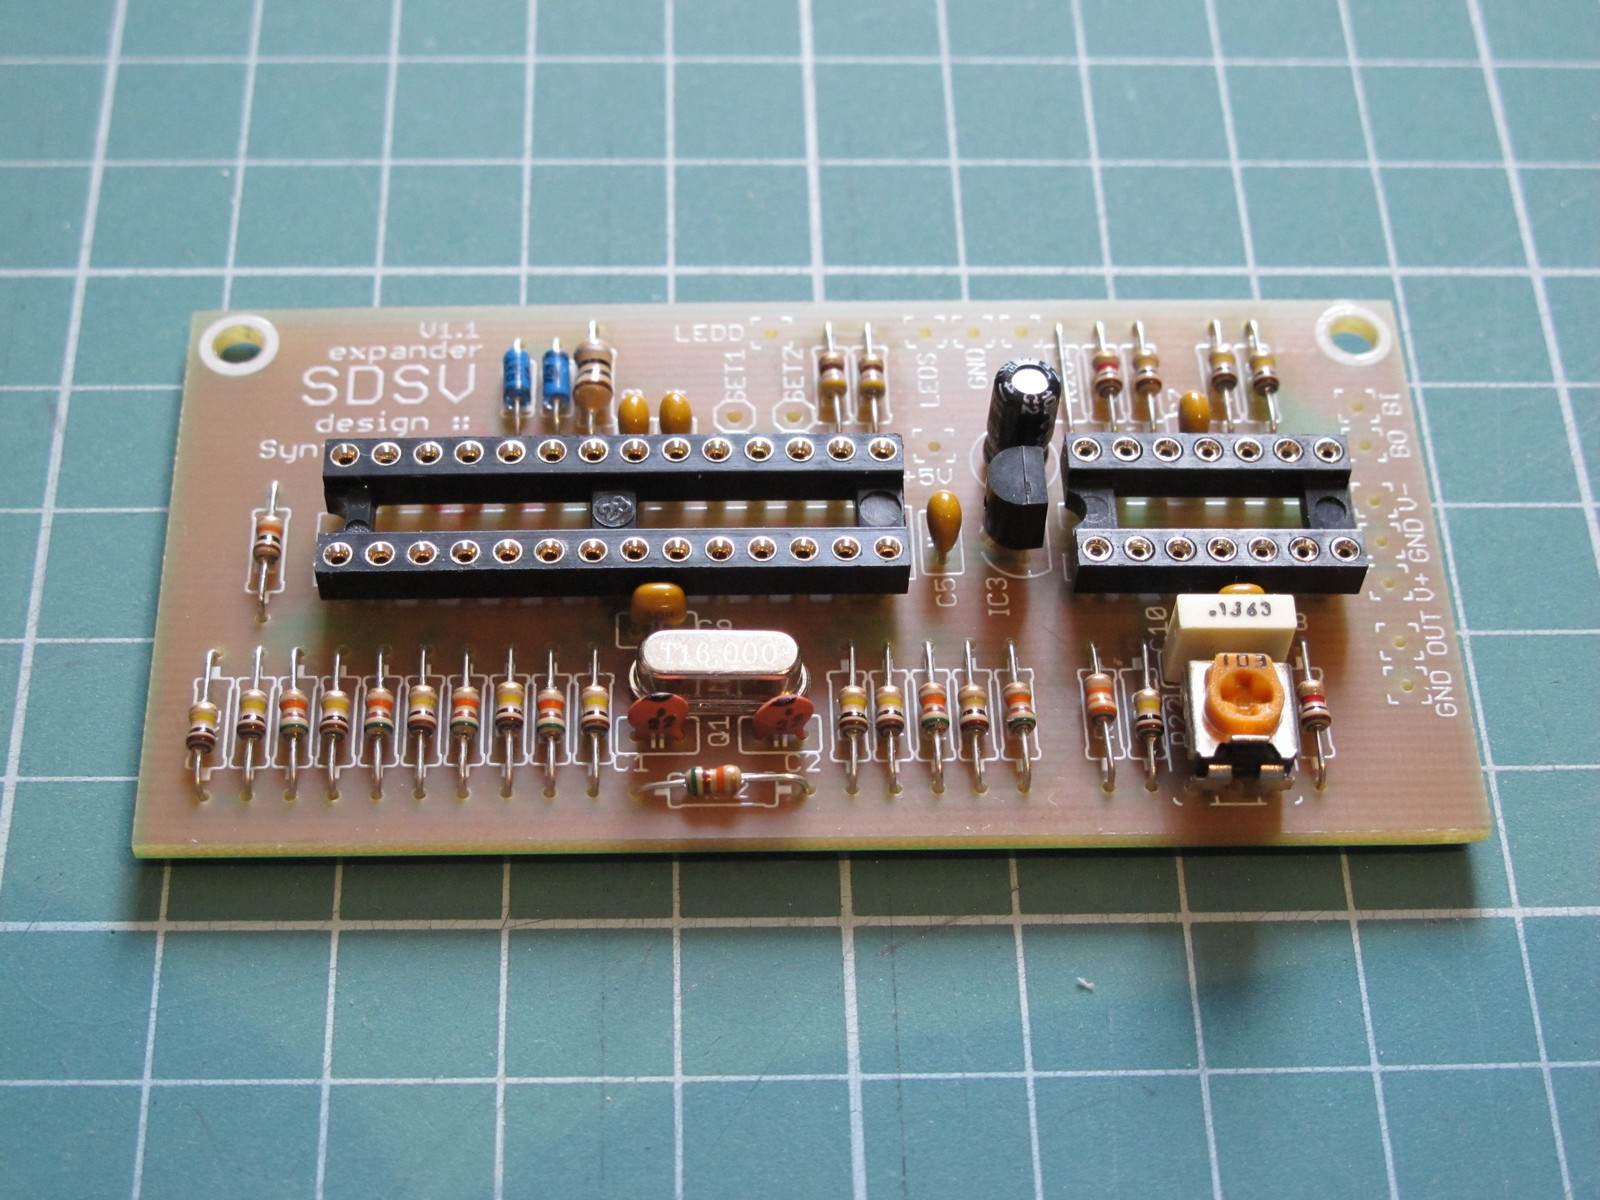 Populated SDSV expander PCB